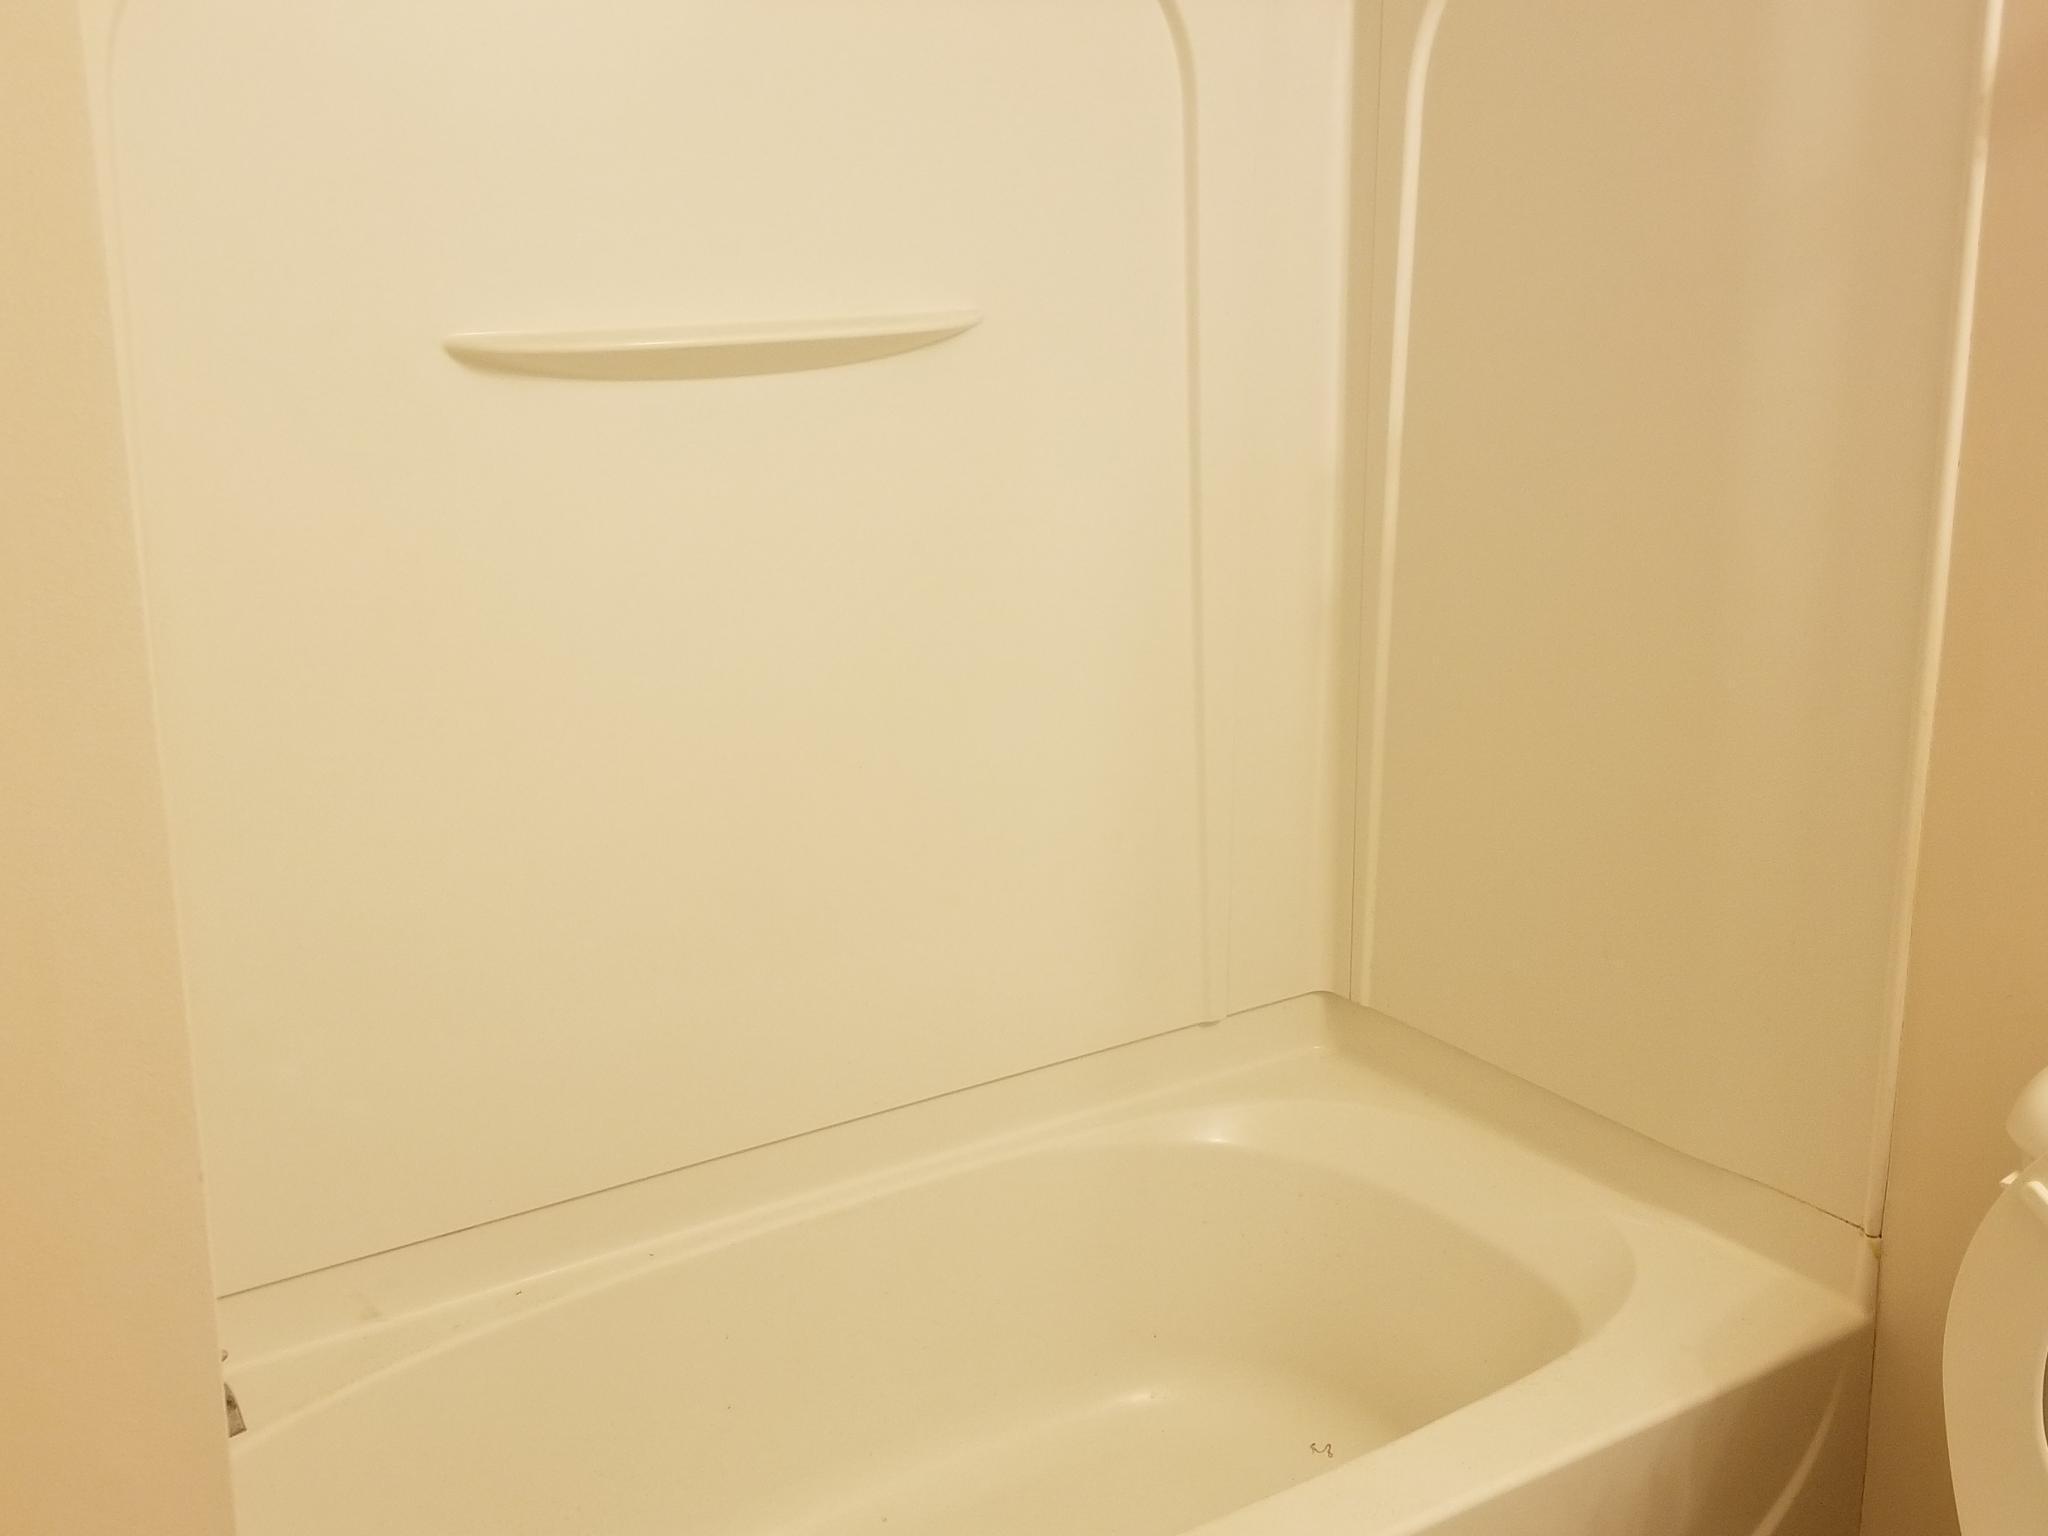 2745 Mayfair Dr, Cumming, GA 30040 - 3 Bed, 2 5 Bath Single